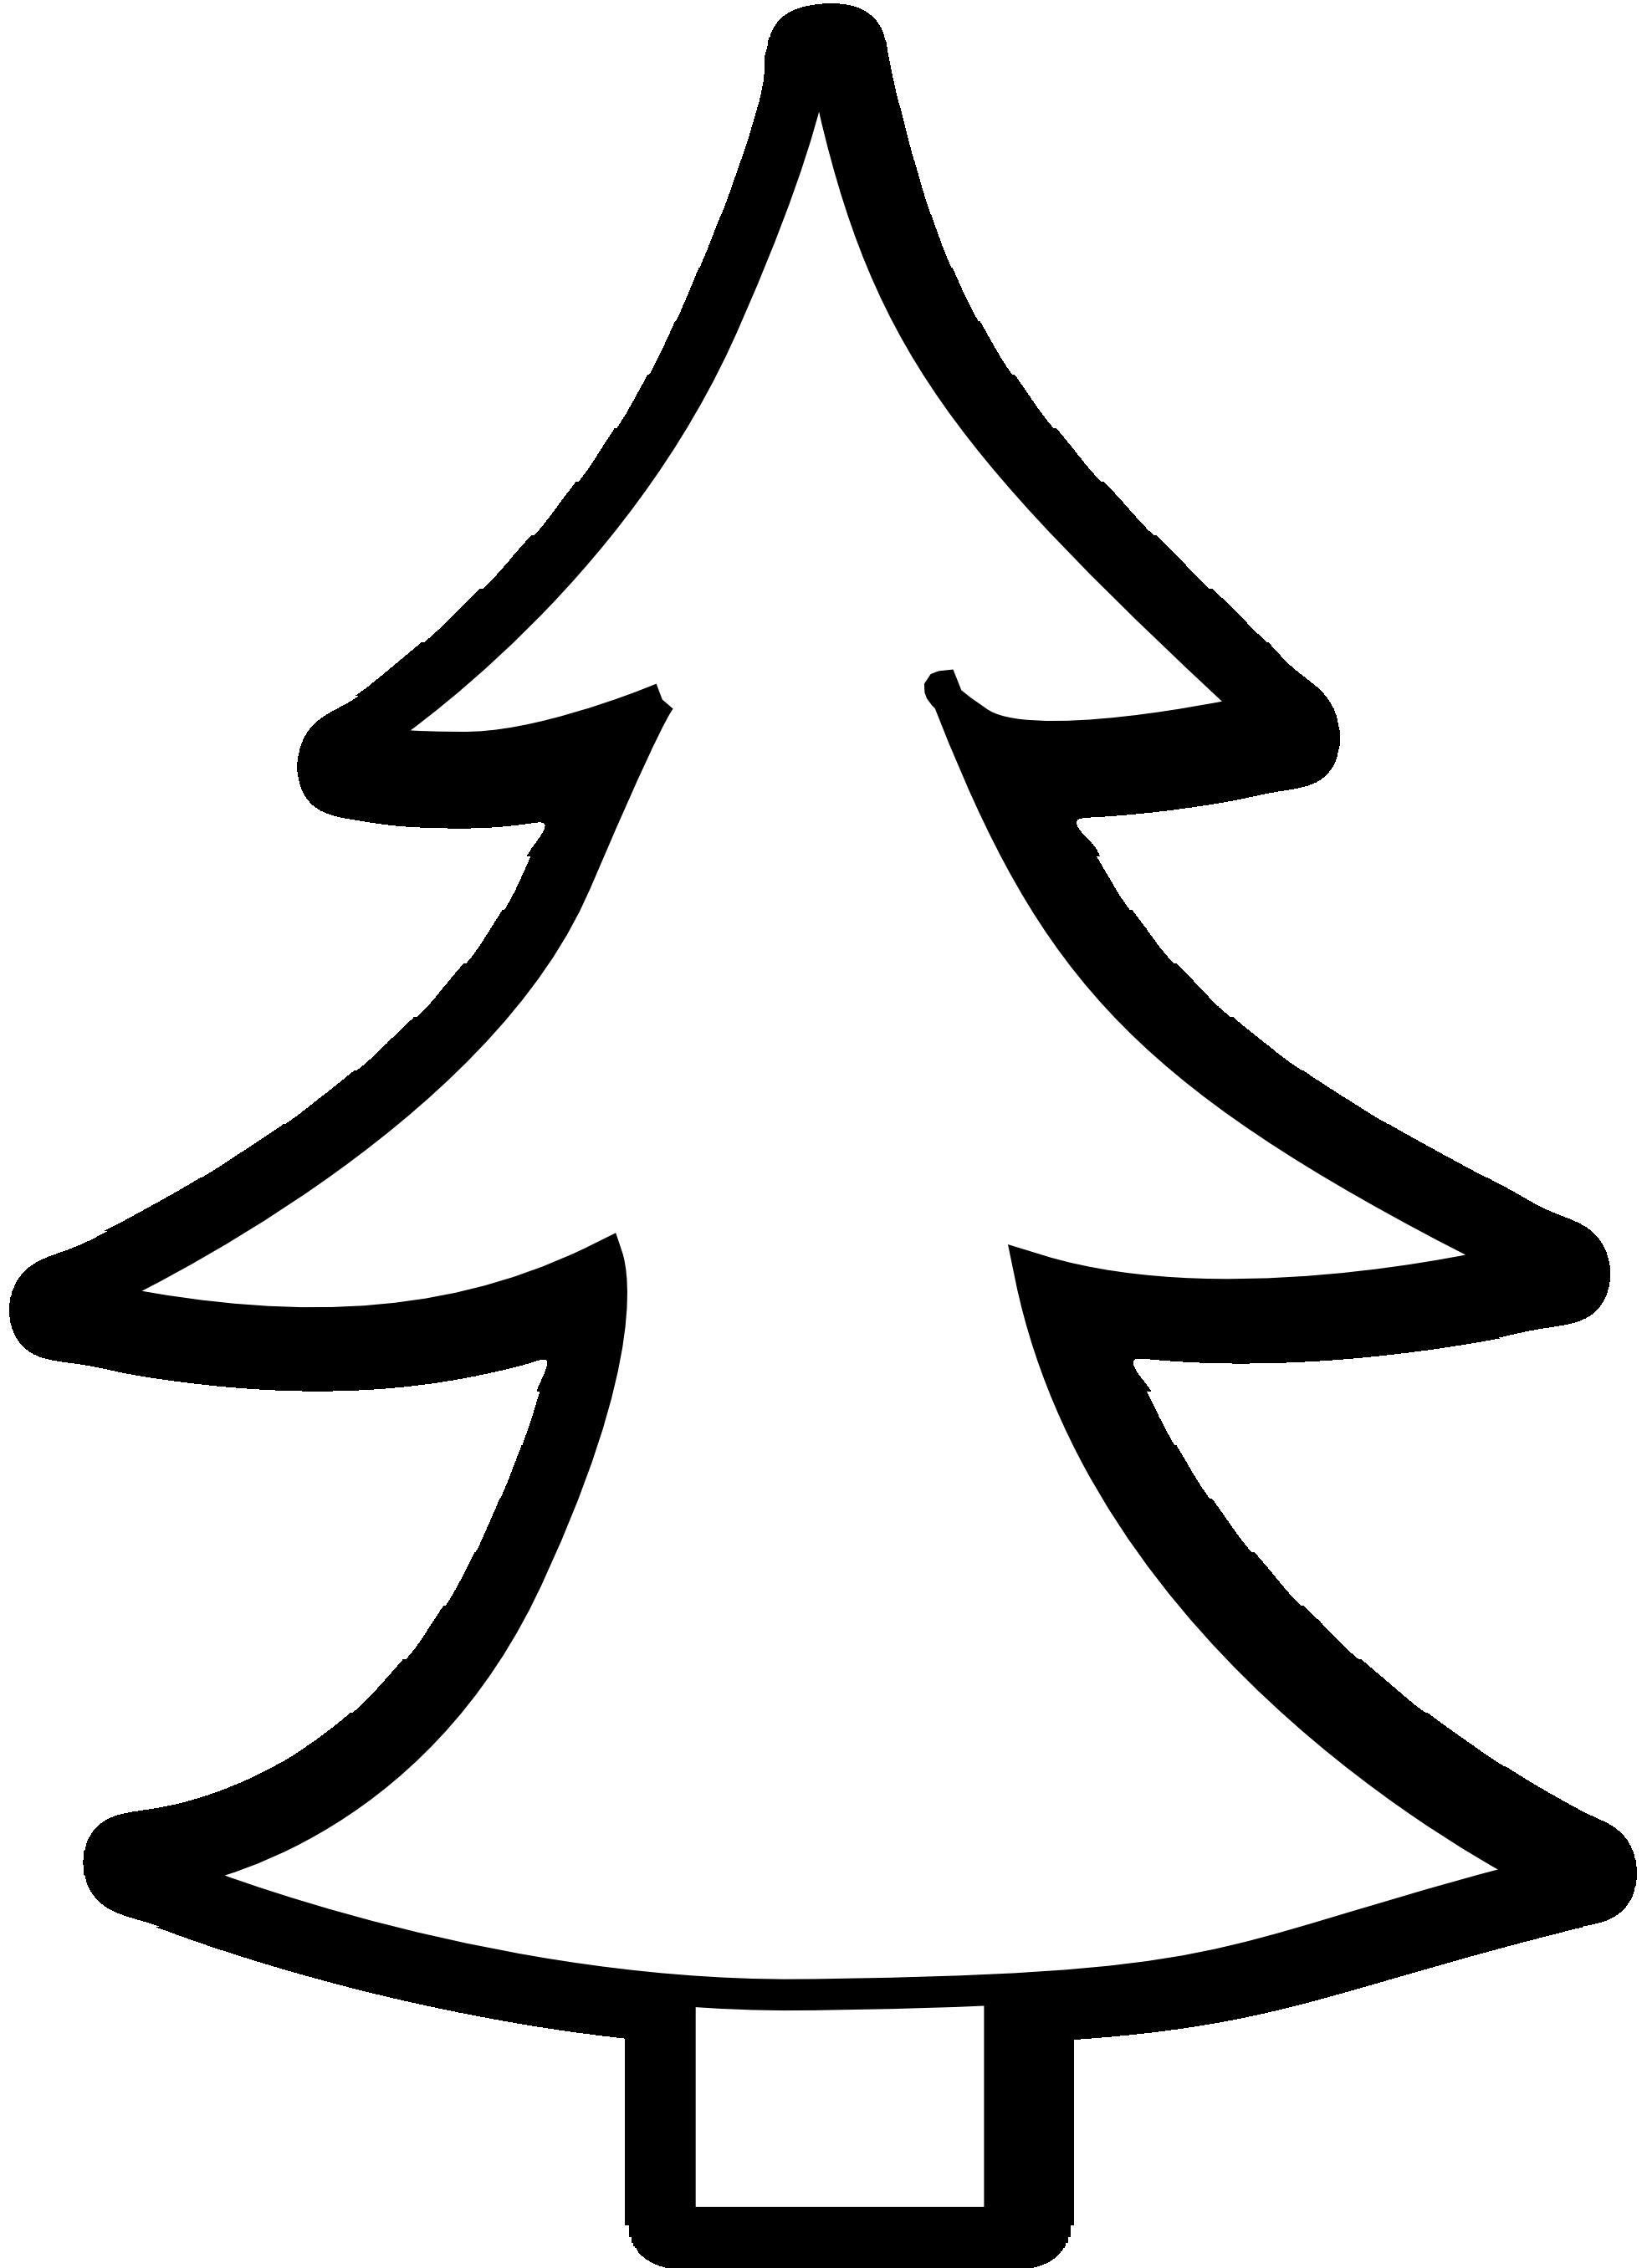 Black Tree Clipart - Clipart Kid